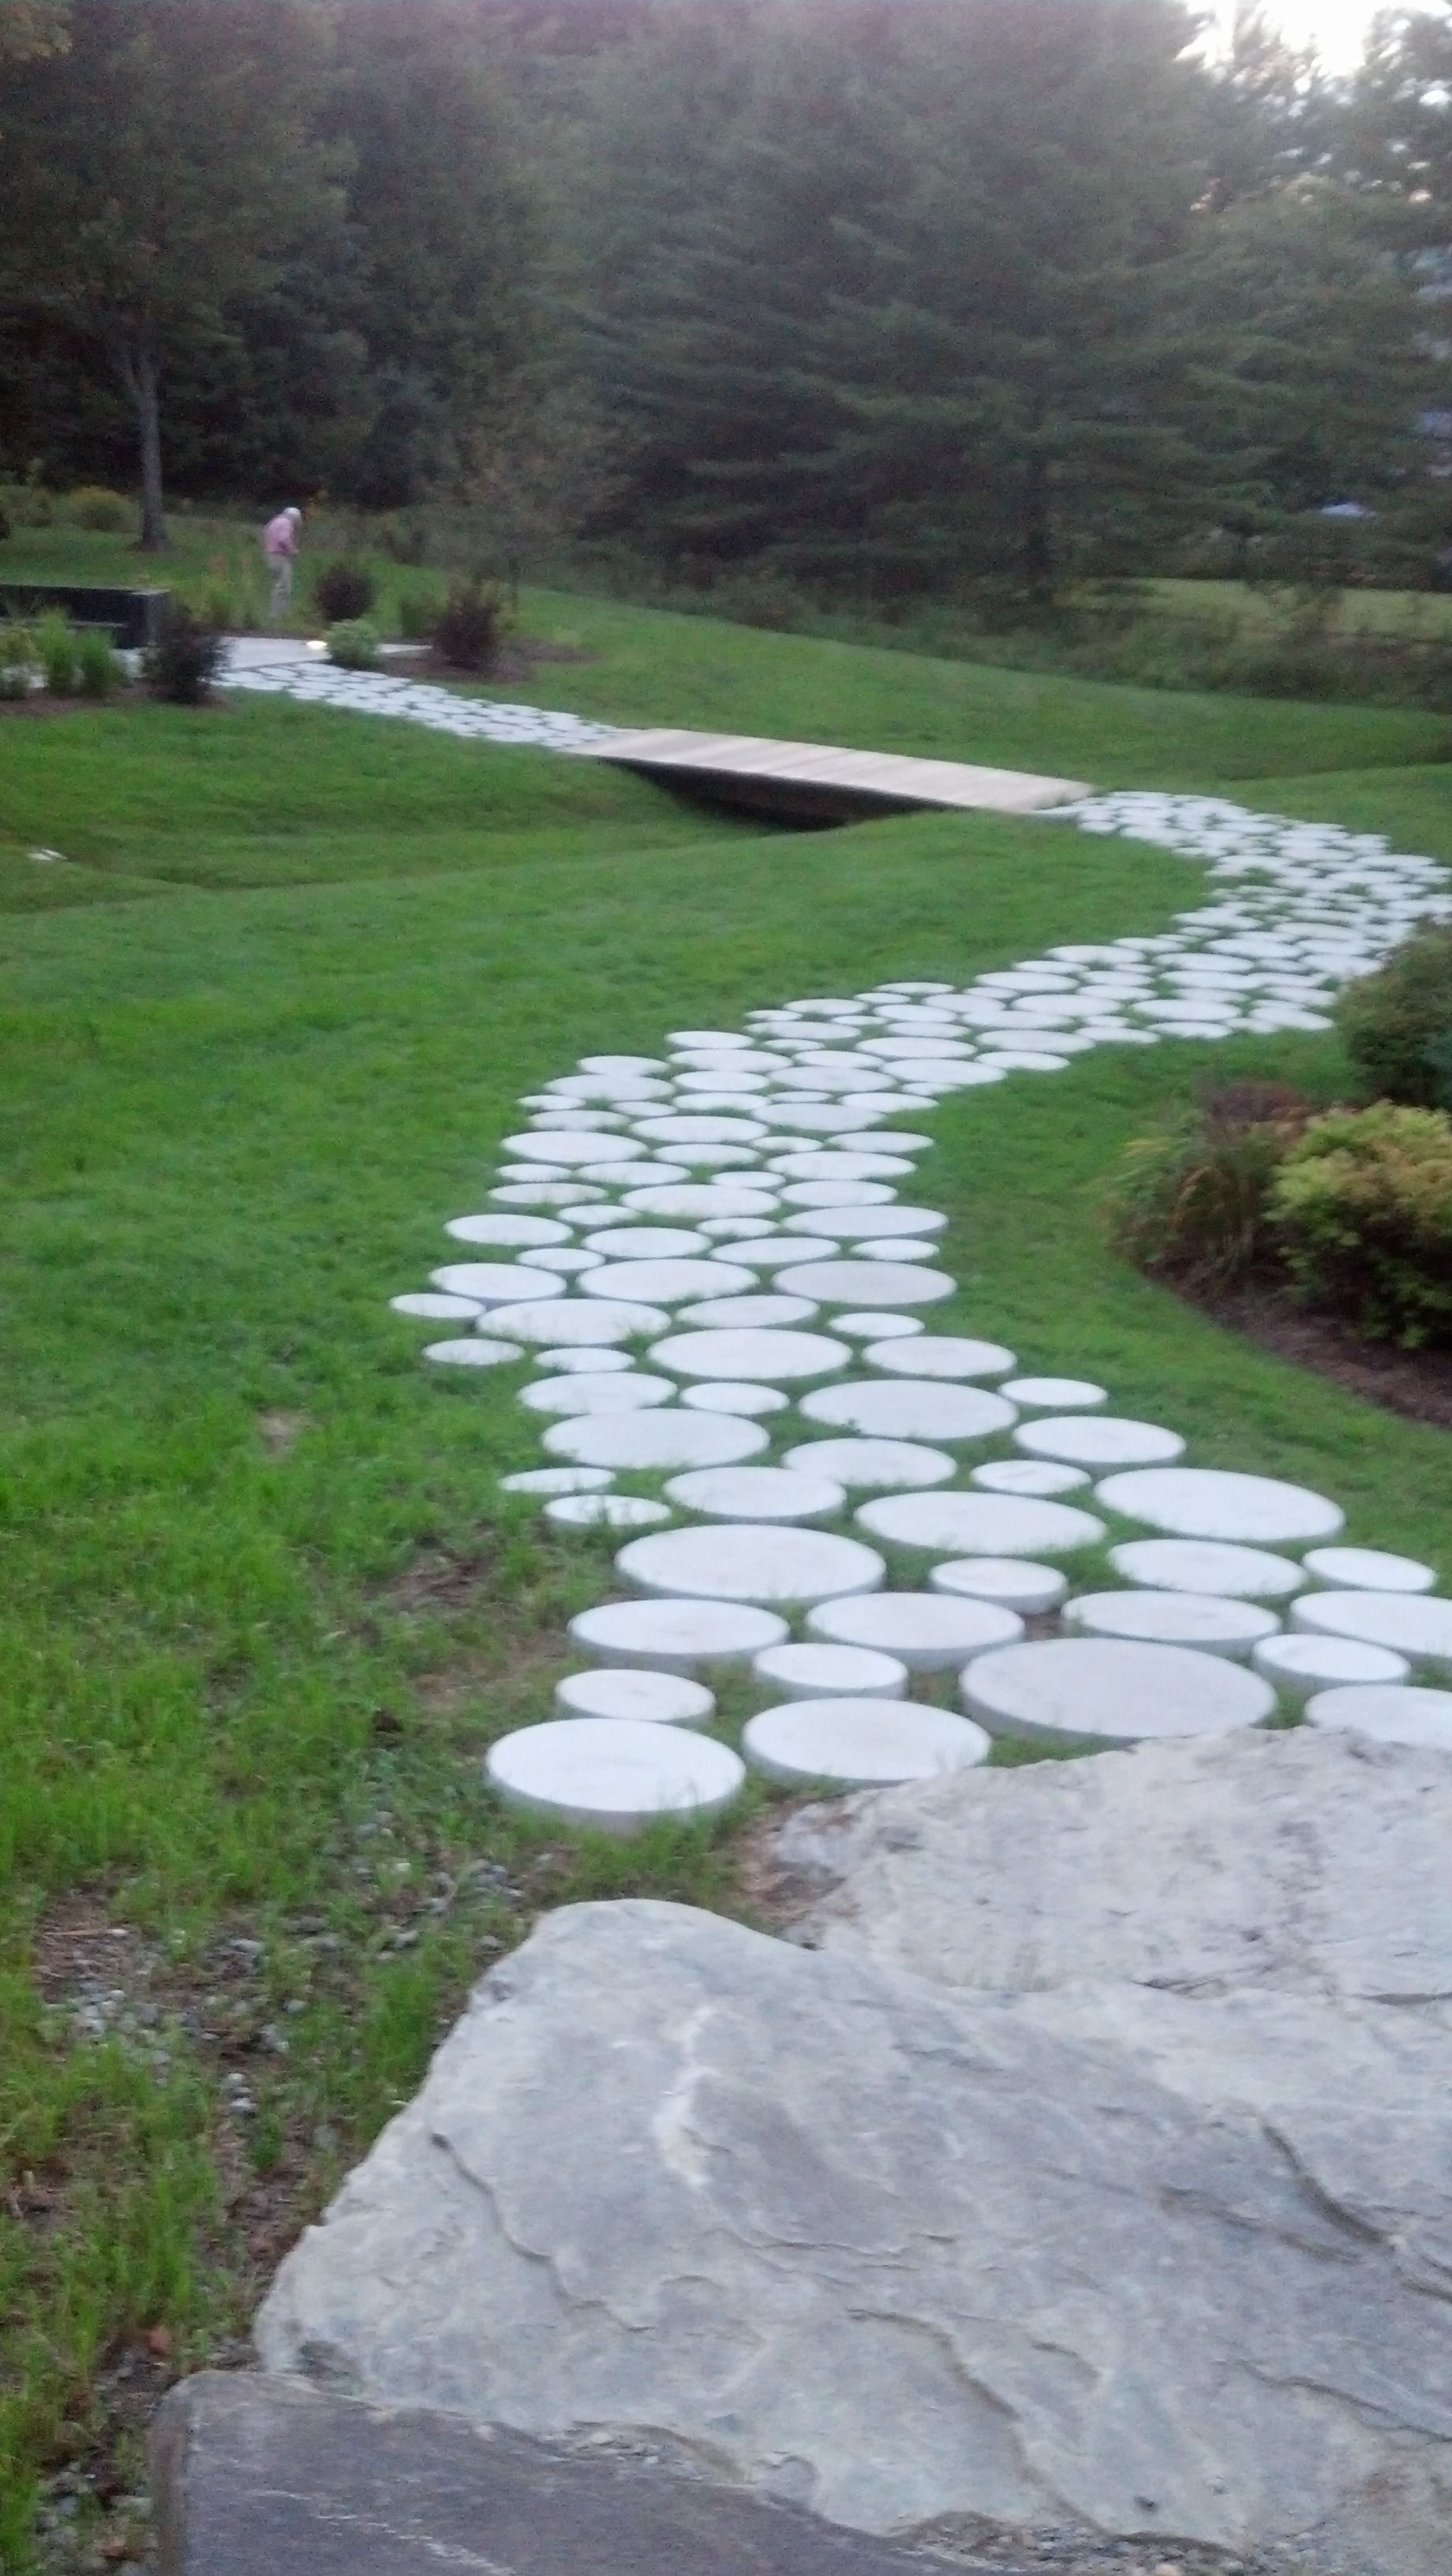 Landscaping Projects 2012 08 13 20 08 48 Mansfield Custom Homes Terrace Garden Design Stone Garden Paths Garden Pavers